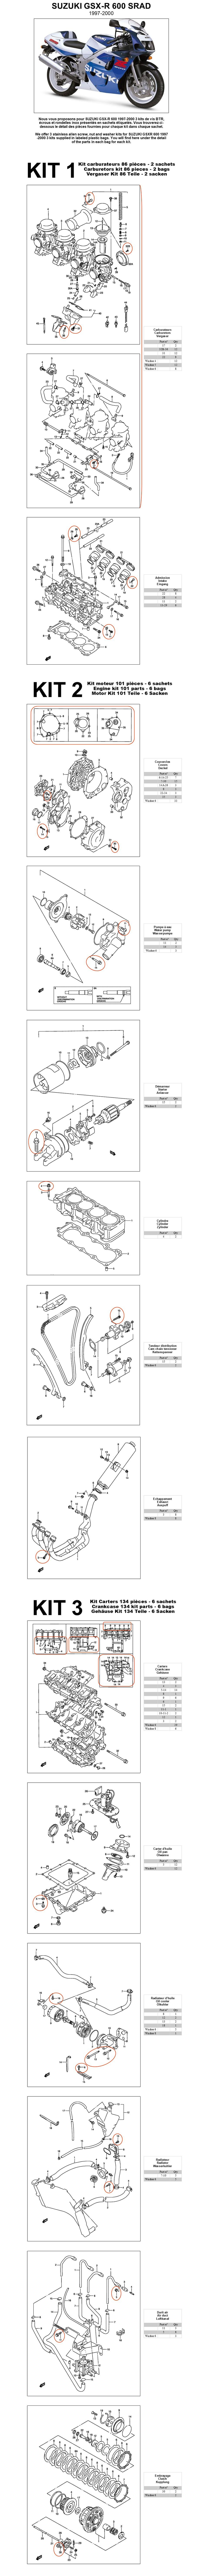 medium resolution of srad gsxr 600 wiring diagram 1997